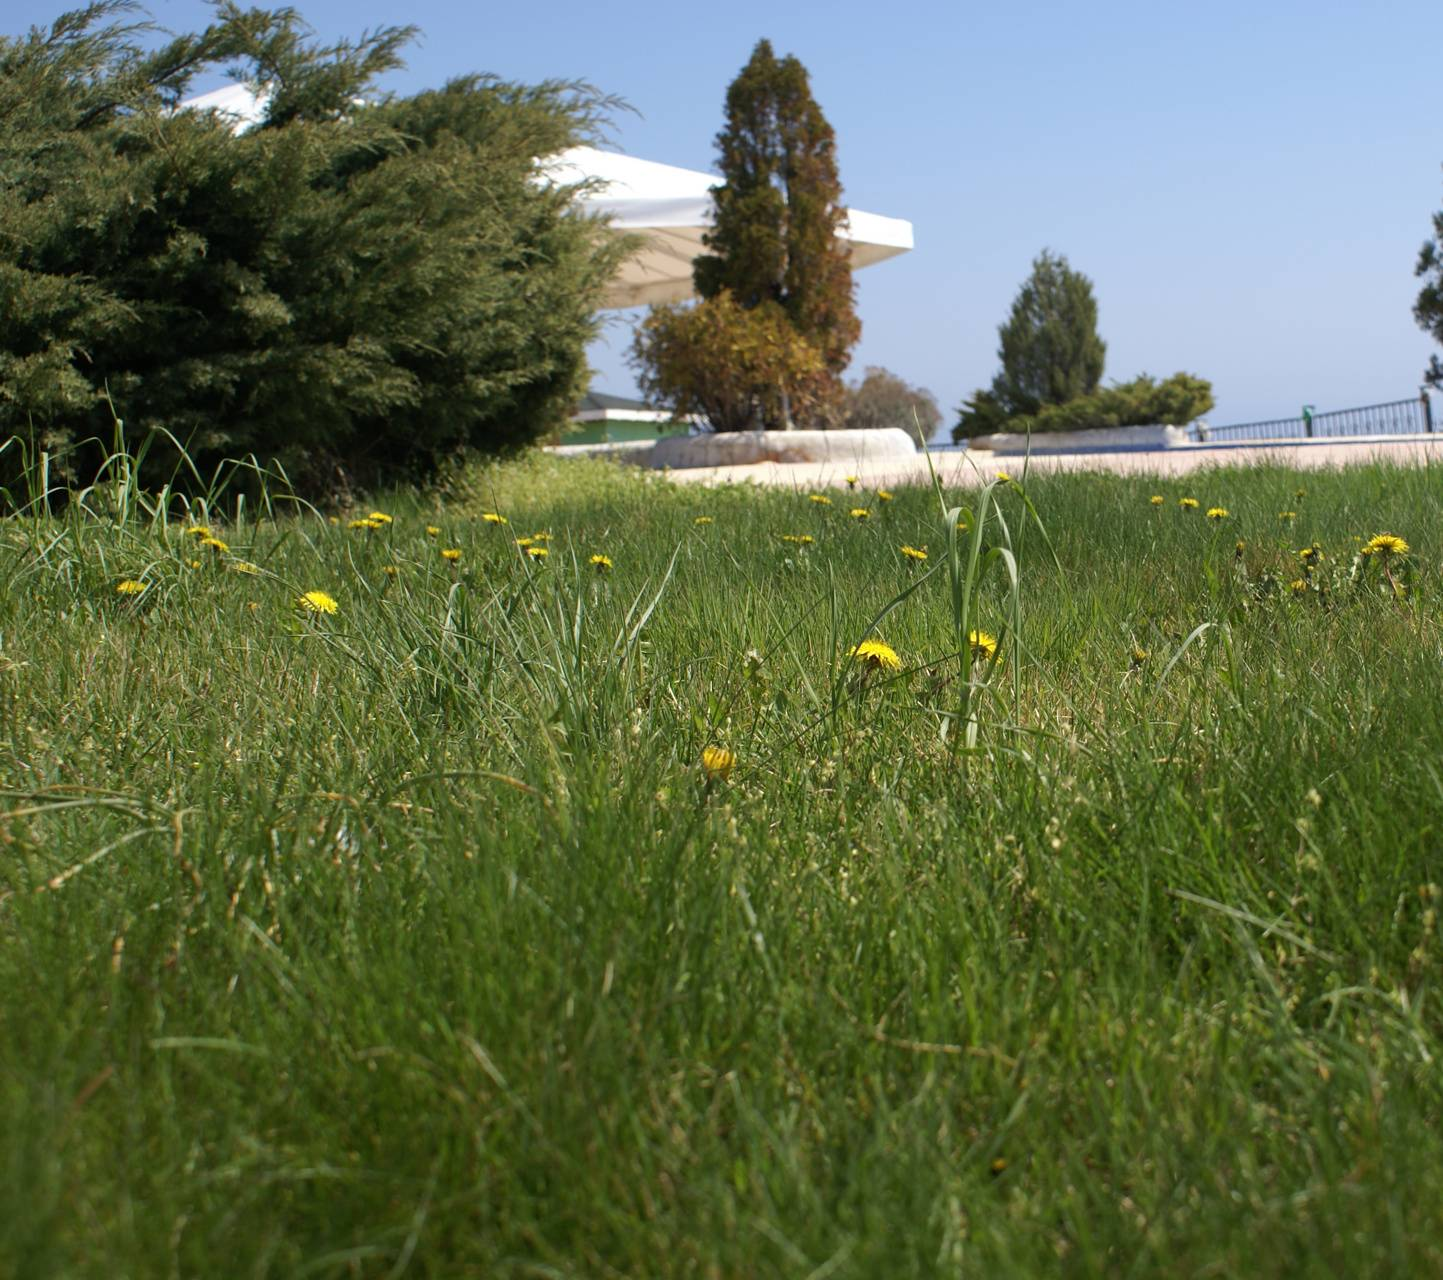 Day vegetation